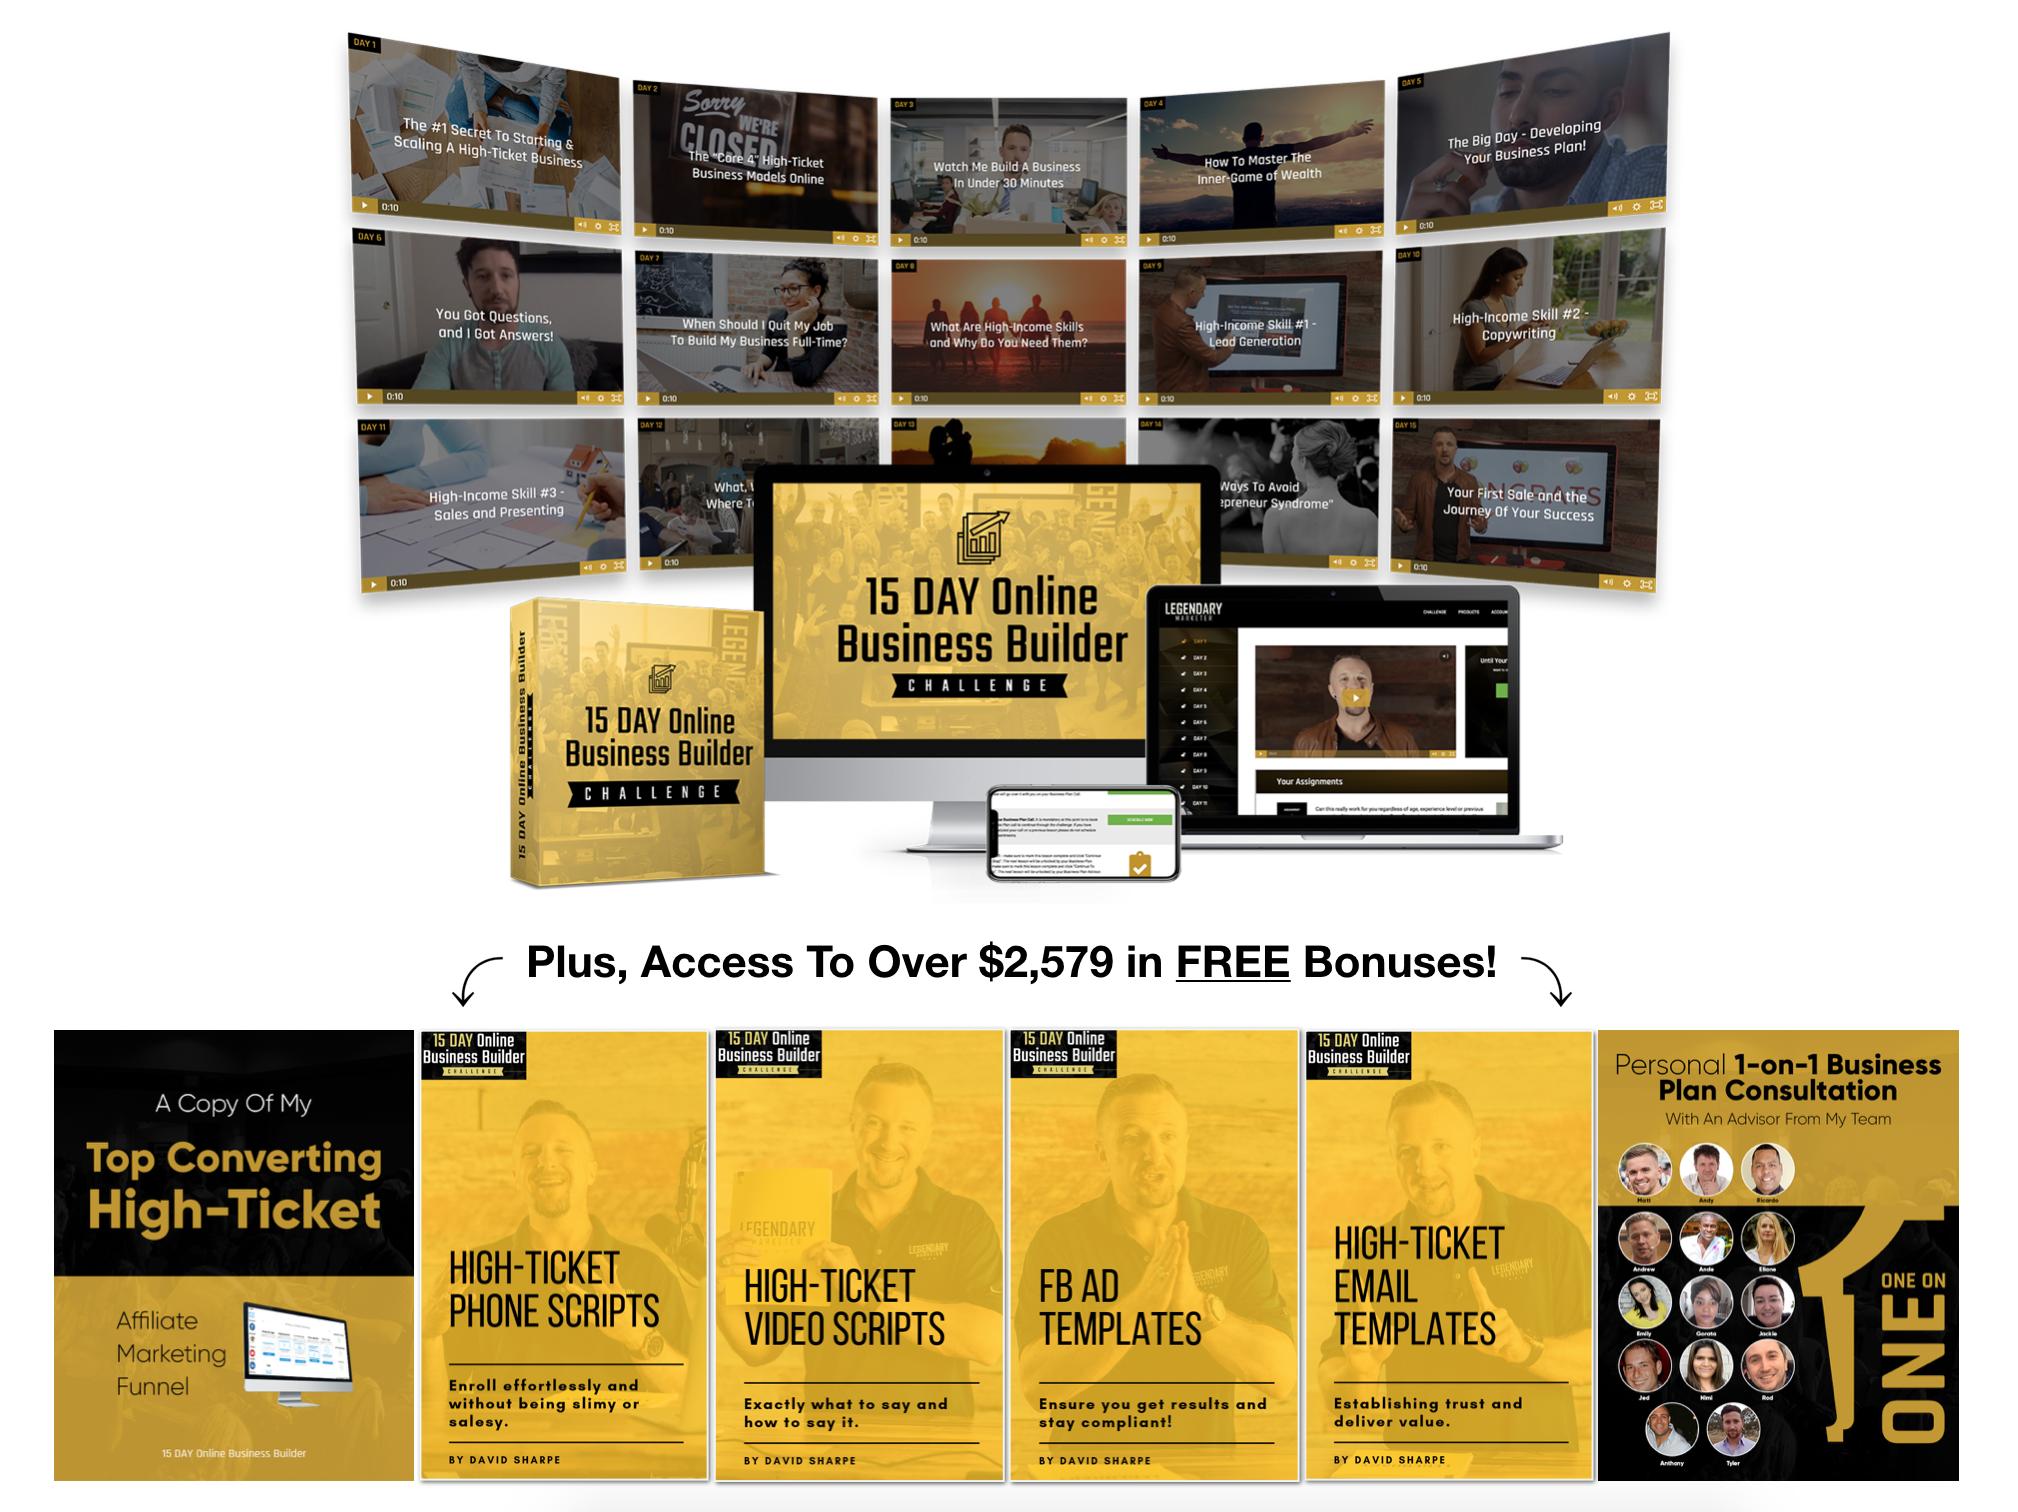 Free Bonuses by Legendary Marketer